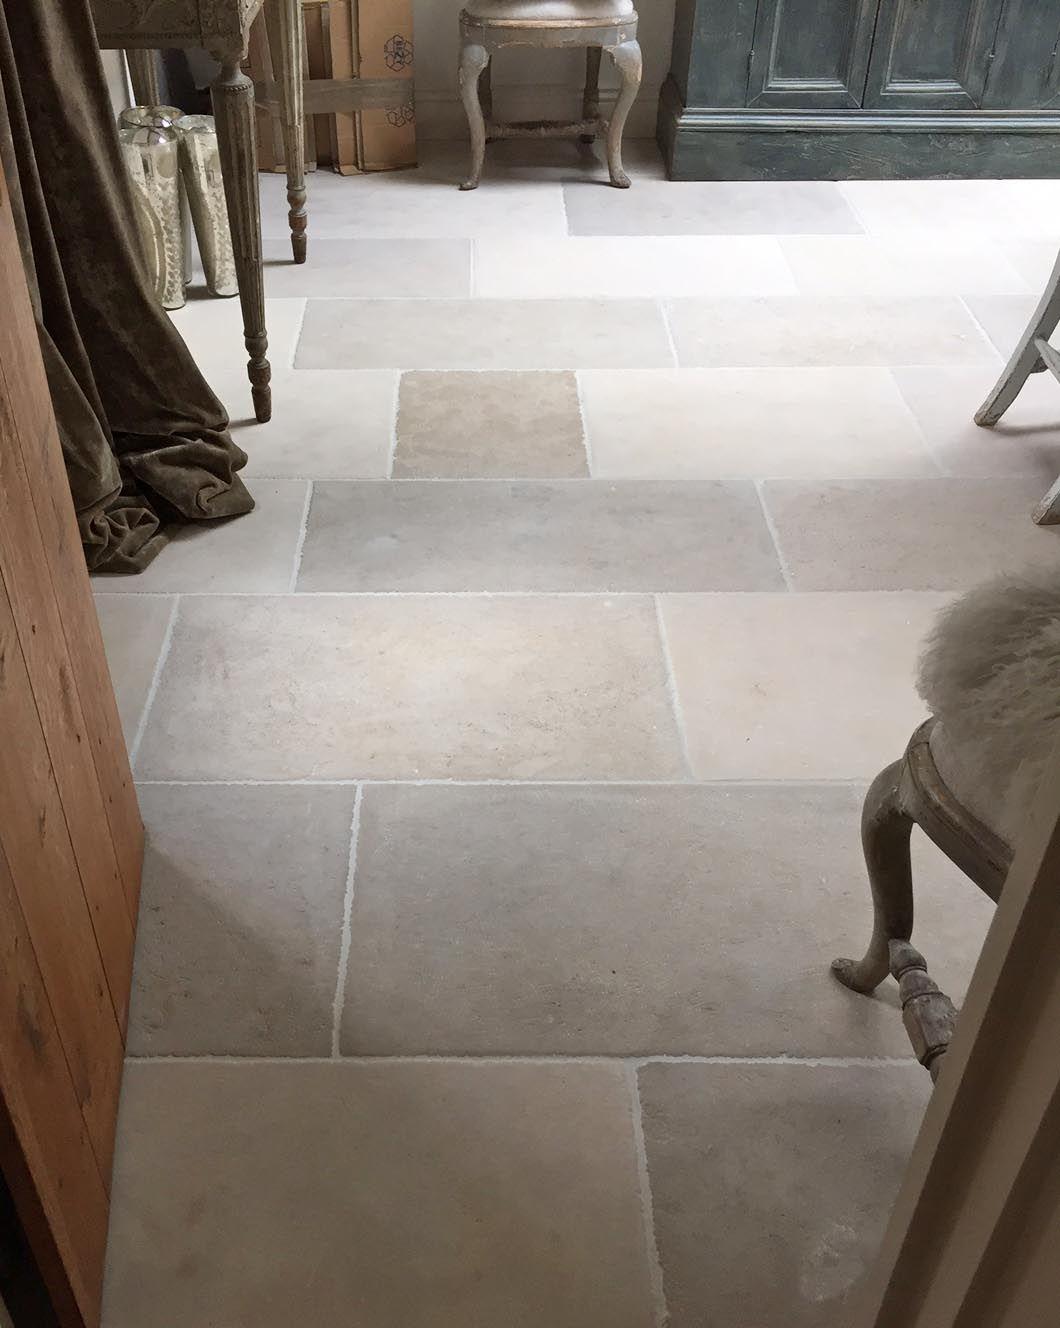 Paris casa rustic grey limestone floor tiles feature in this paris casa rustic grey limestone floor tiles feature in this traditional style kitchen and dining doublecrazyfo Image collections